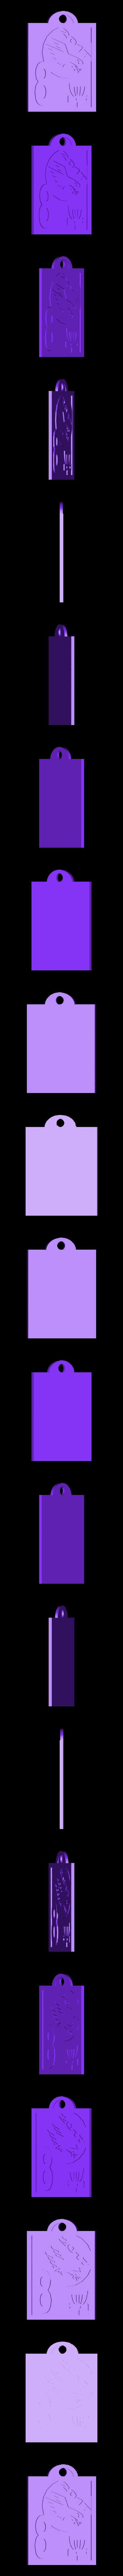 Disc_Bag_Tag_8.stl Download free STL file Disc Golf Bag Tag • 3D print design, mrhers2